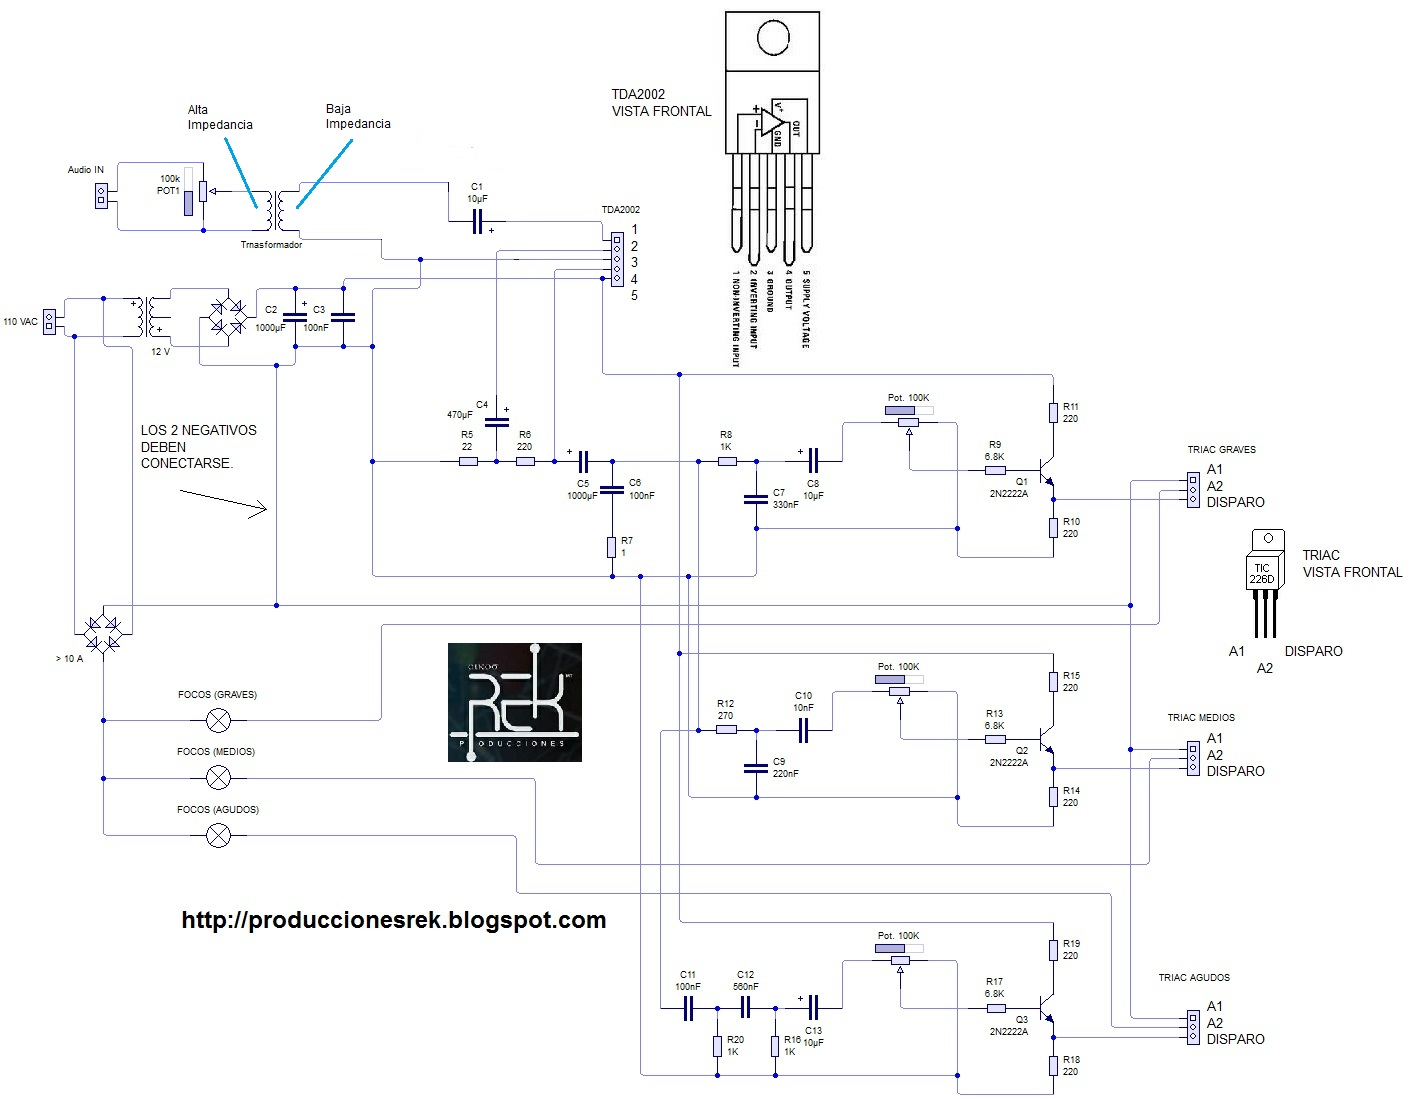 Circuito Luces Audioritmicas : Producciones rek diagramas y electronica luces ritmicas